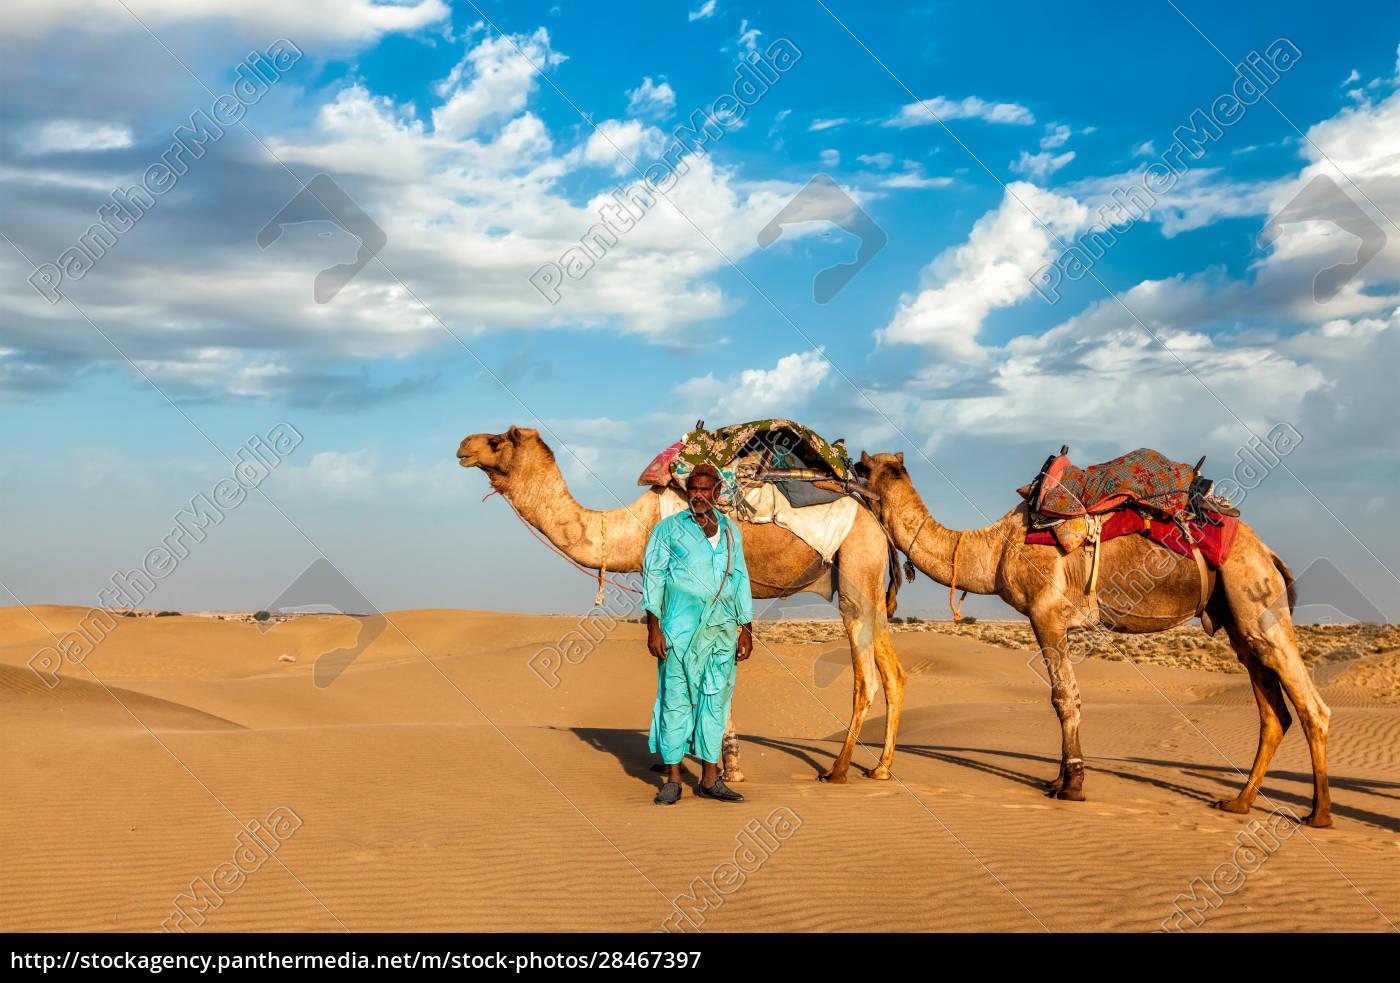 kamel-kameltreiber, mit, kamelen, in, rajasthan, indien - 28467397